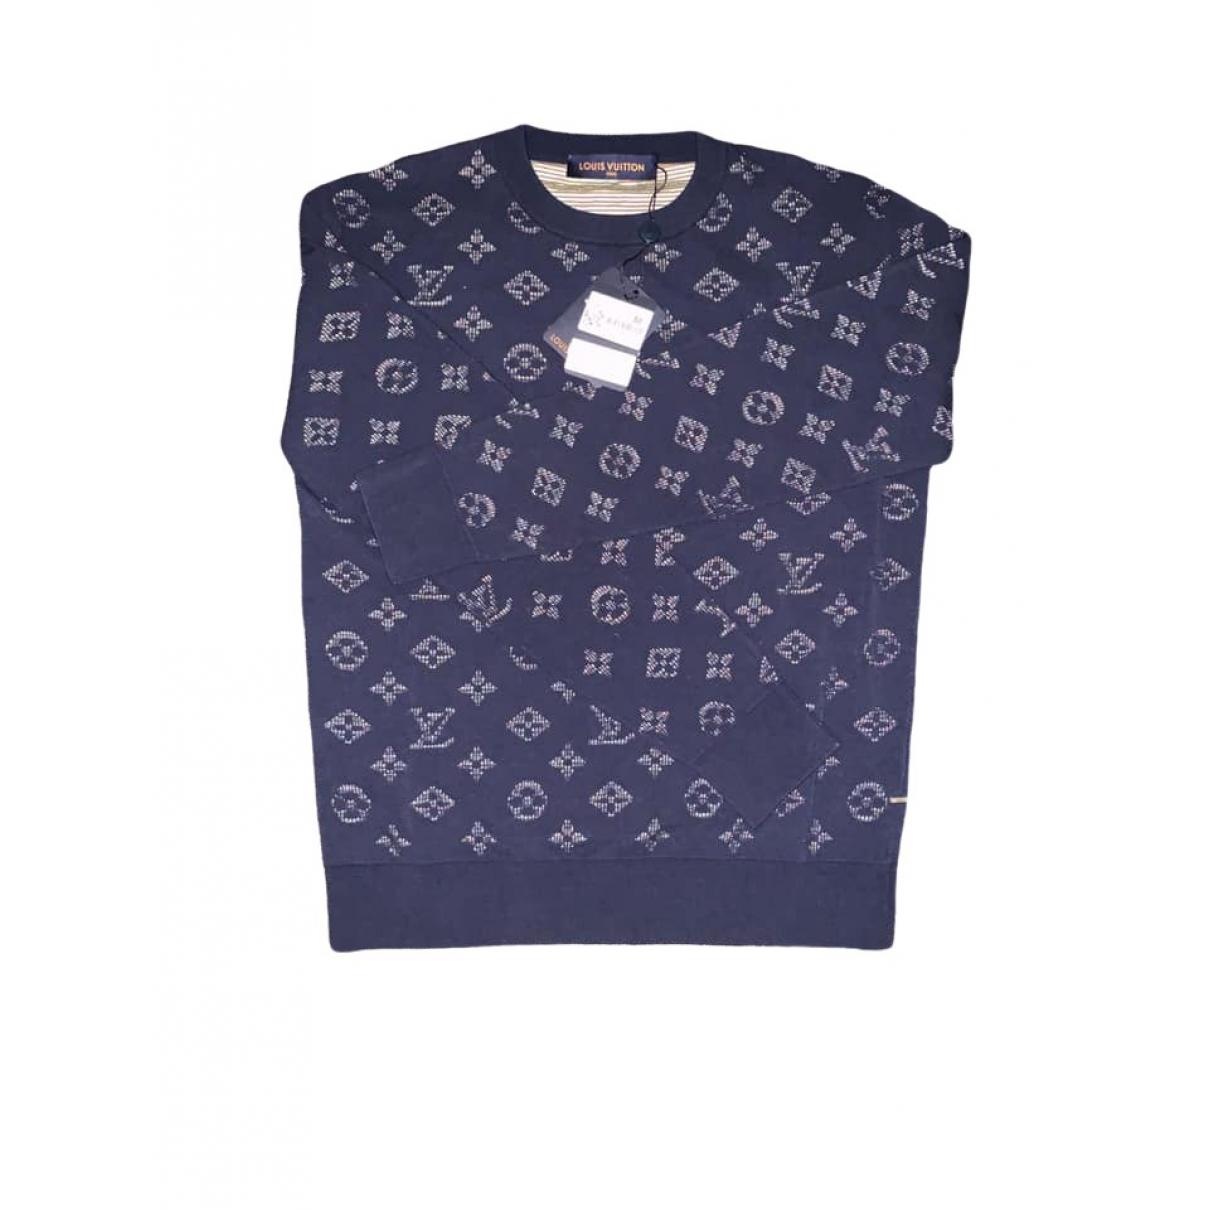 Louis Vuitton \N Navy Knitwear & Sweatshirts for Men XS International